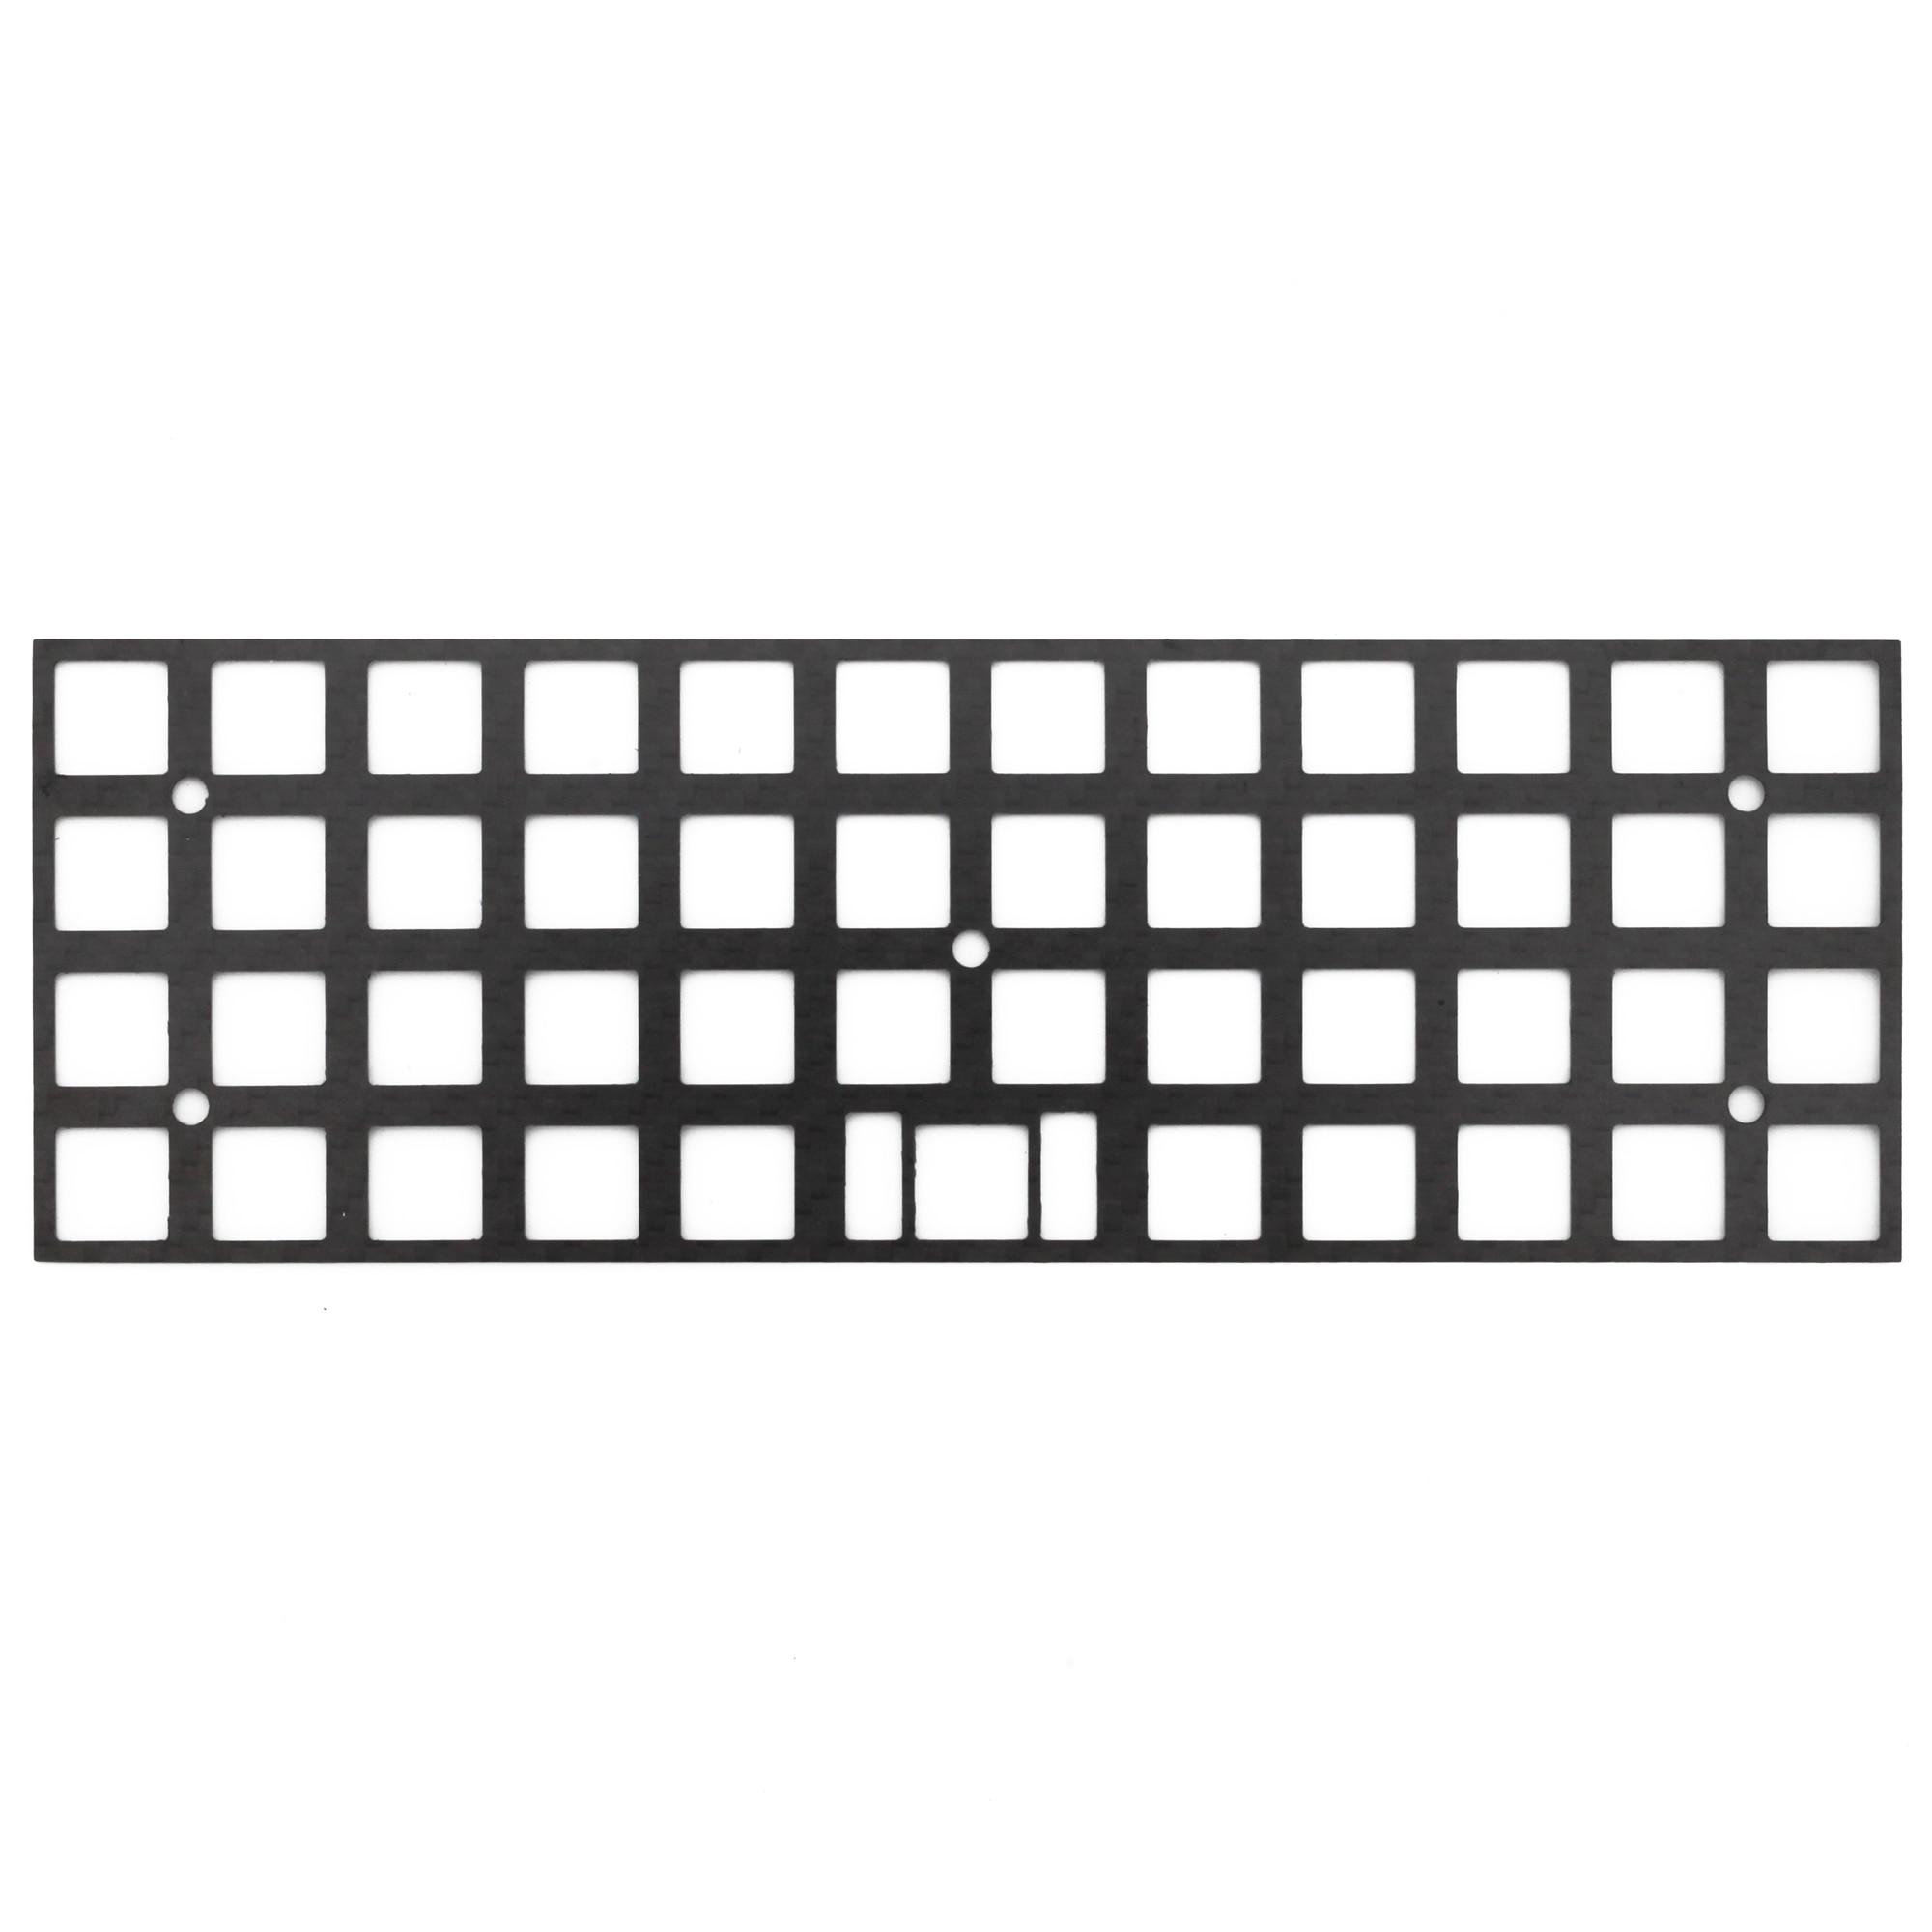 carbon fiber plate for JJ40 BM40 40% custom keyboard Mechanical Keyboard Plate support  mx edition